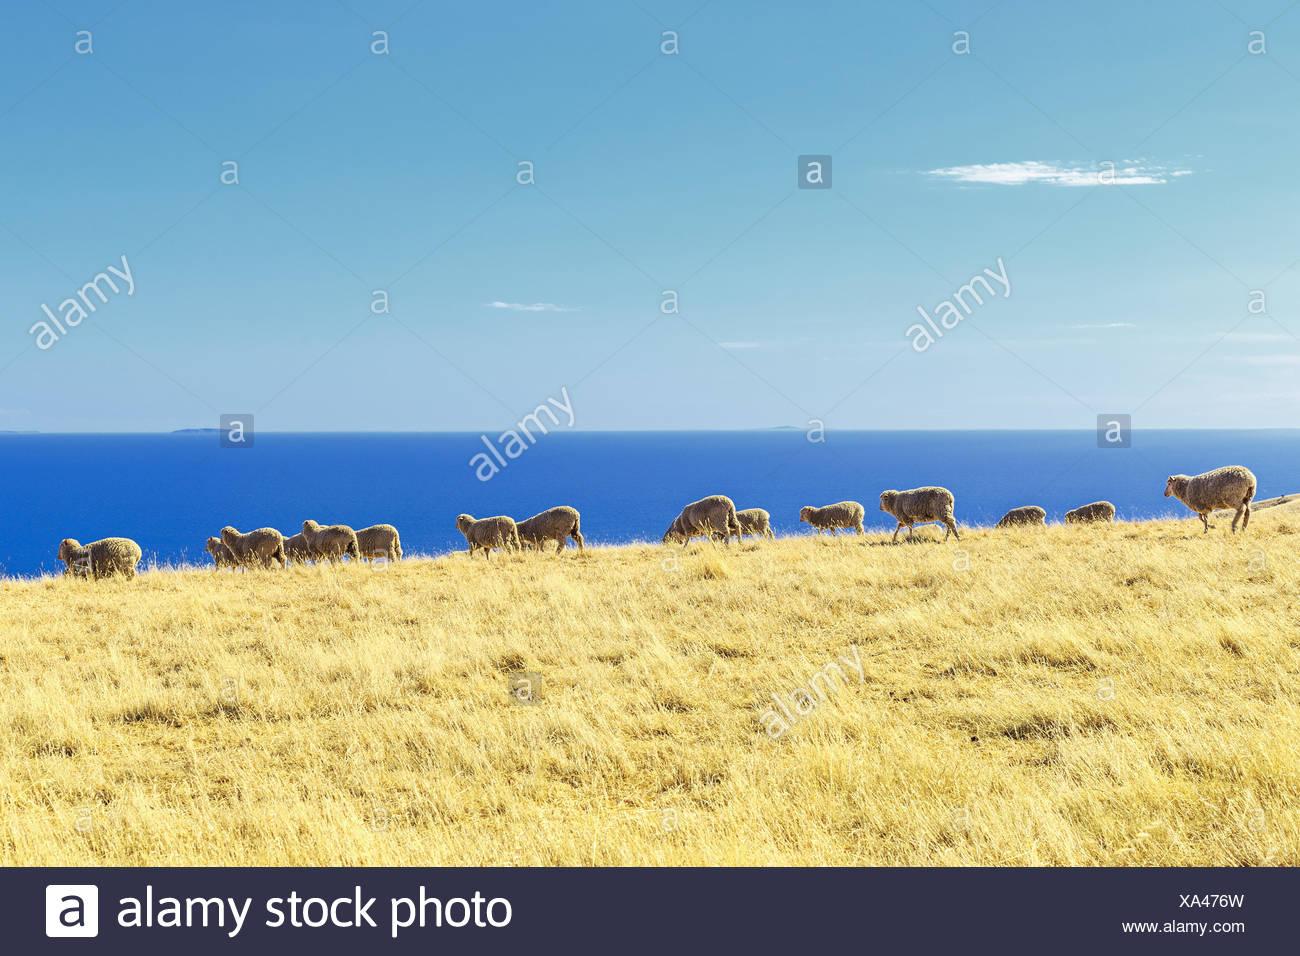 Sheep in a field, Kangaroo Island, Australia - Stock Image